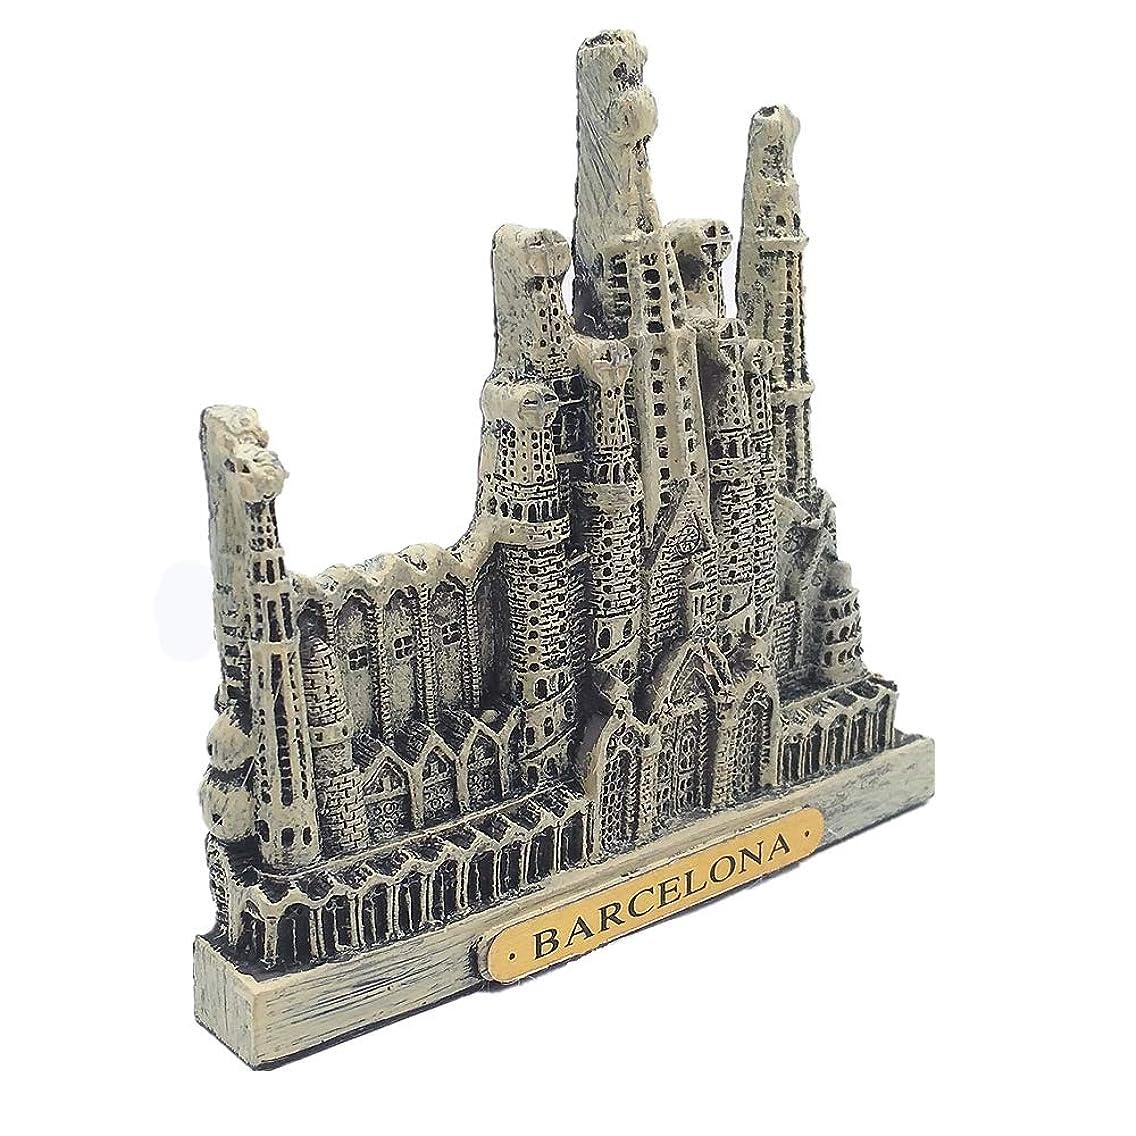 Barcelona Spain Souvenir 3D Fridge Magnet, Home& Kitchen Decoration polyresin Barcelona Spain Refrigerator Magnet